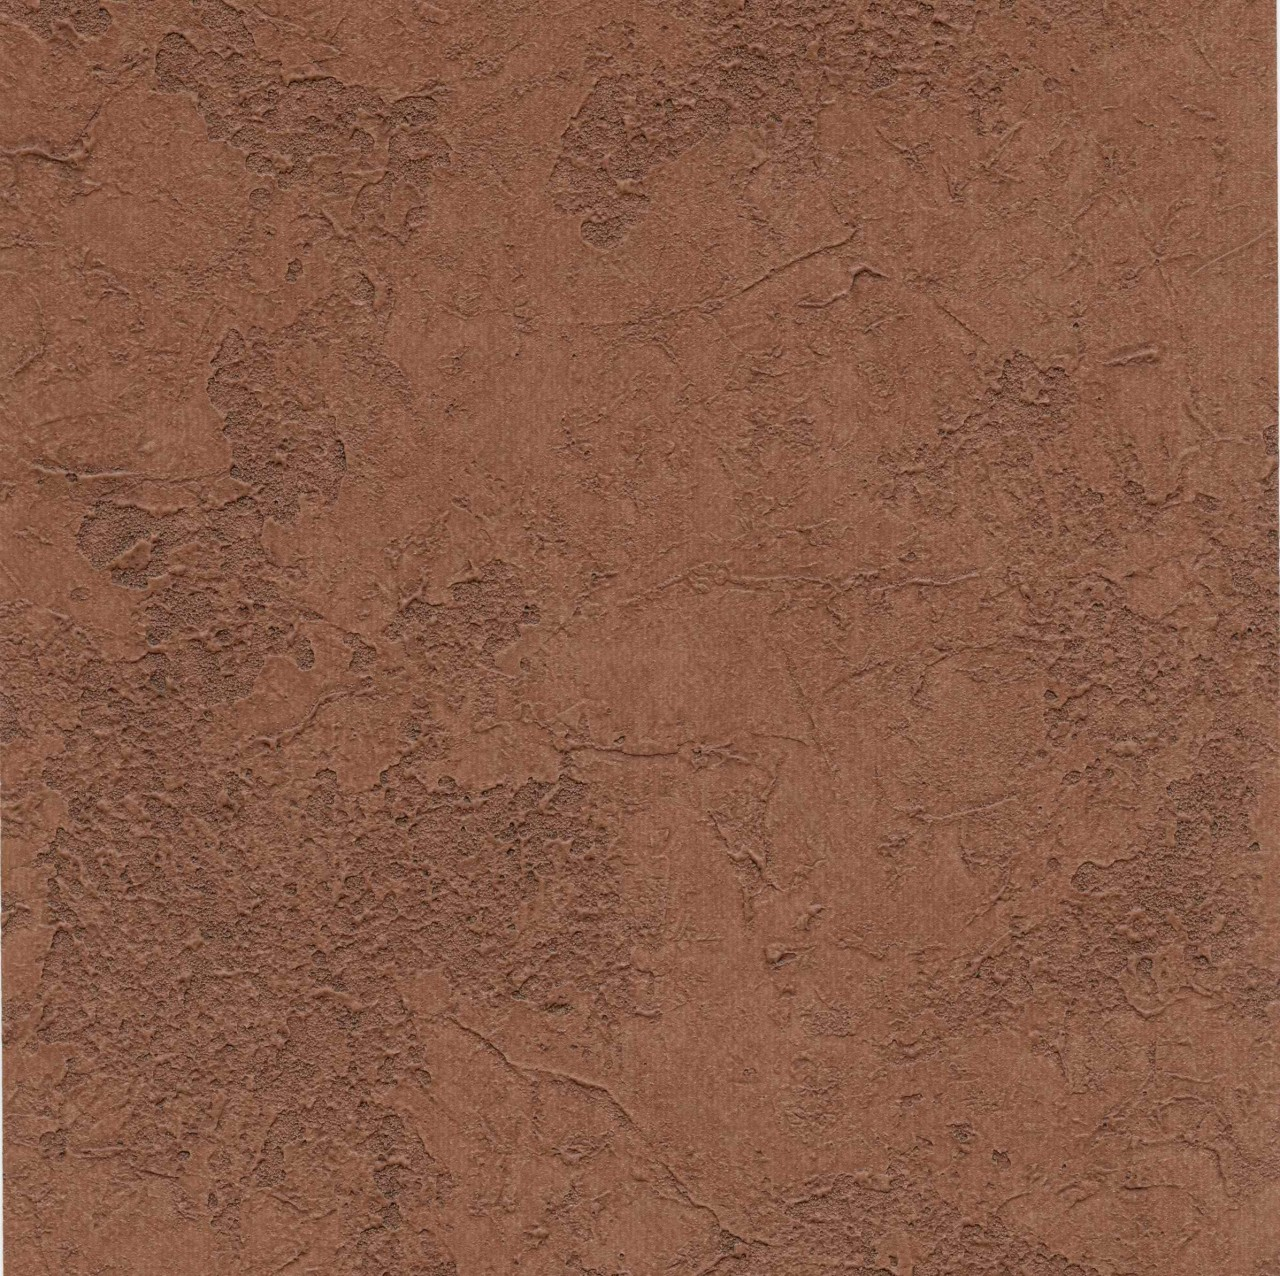 Plain Brown Backgrounds wallpaper Plain Brown Backgrounds hd 1280x1276